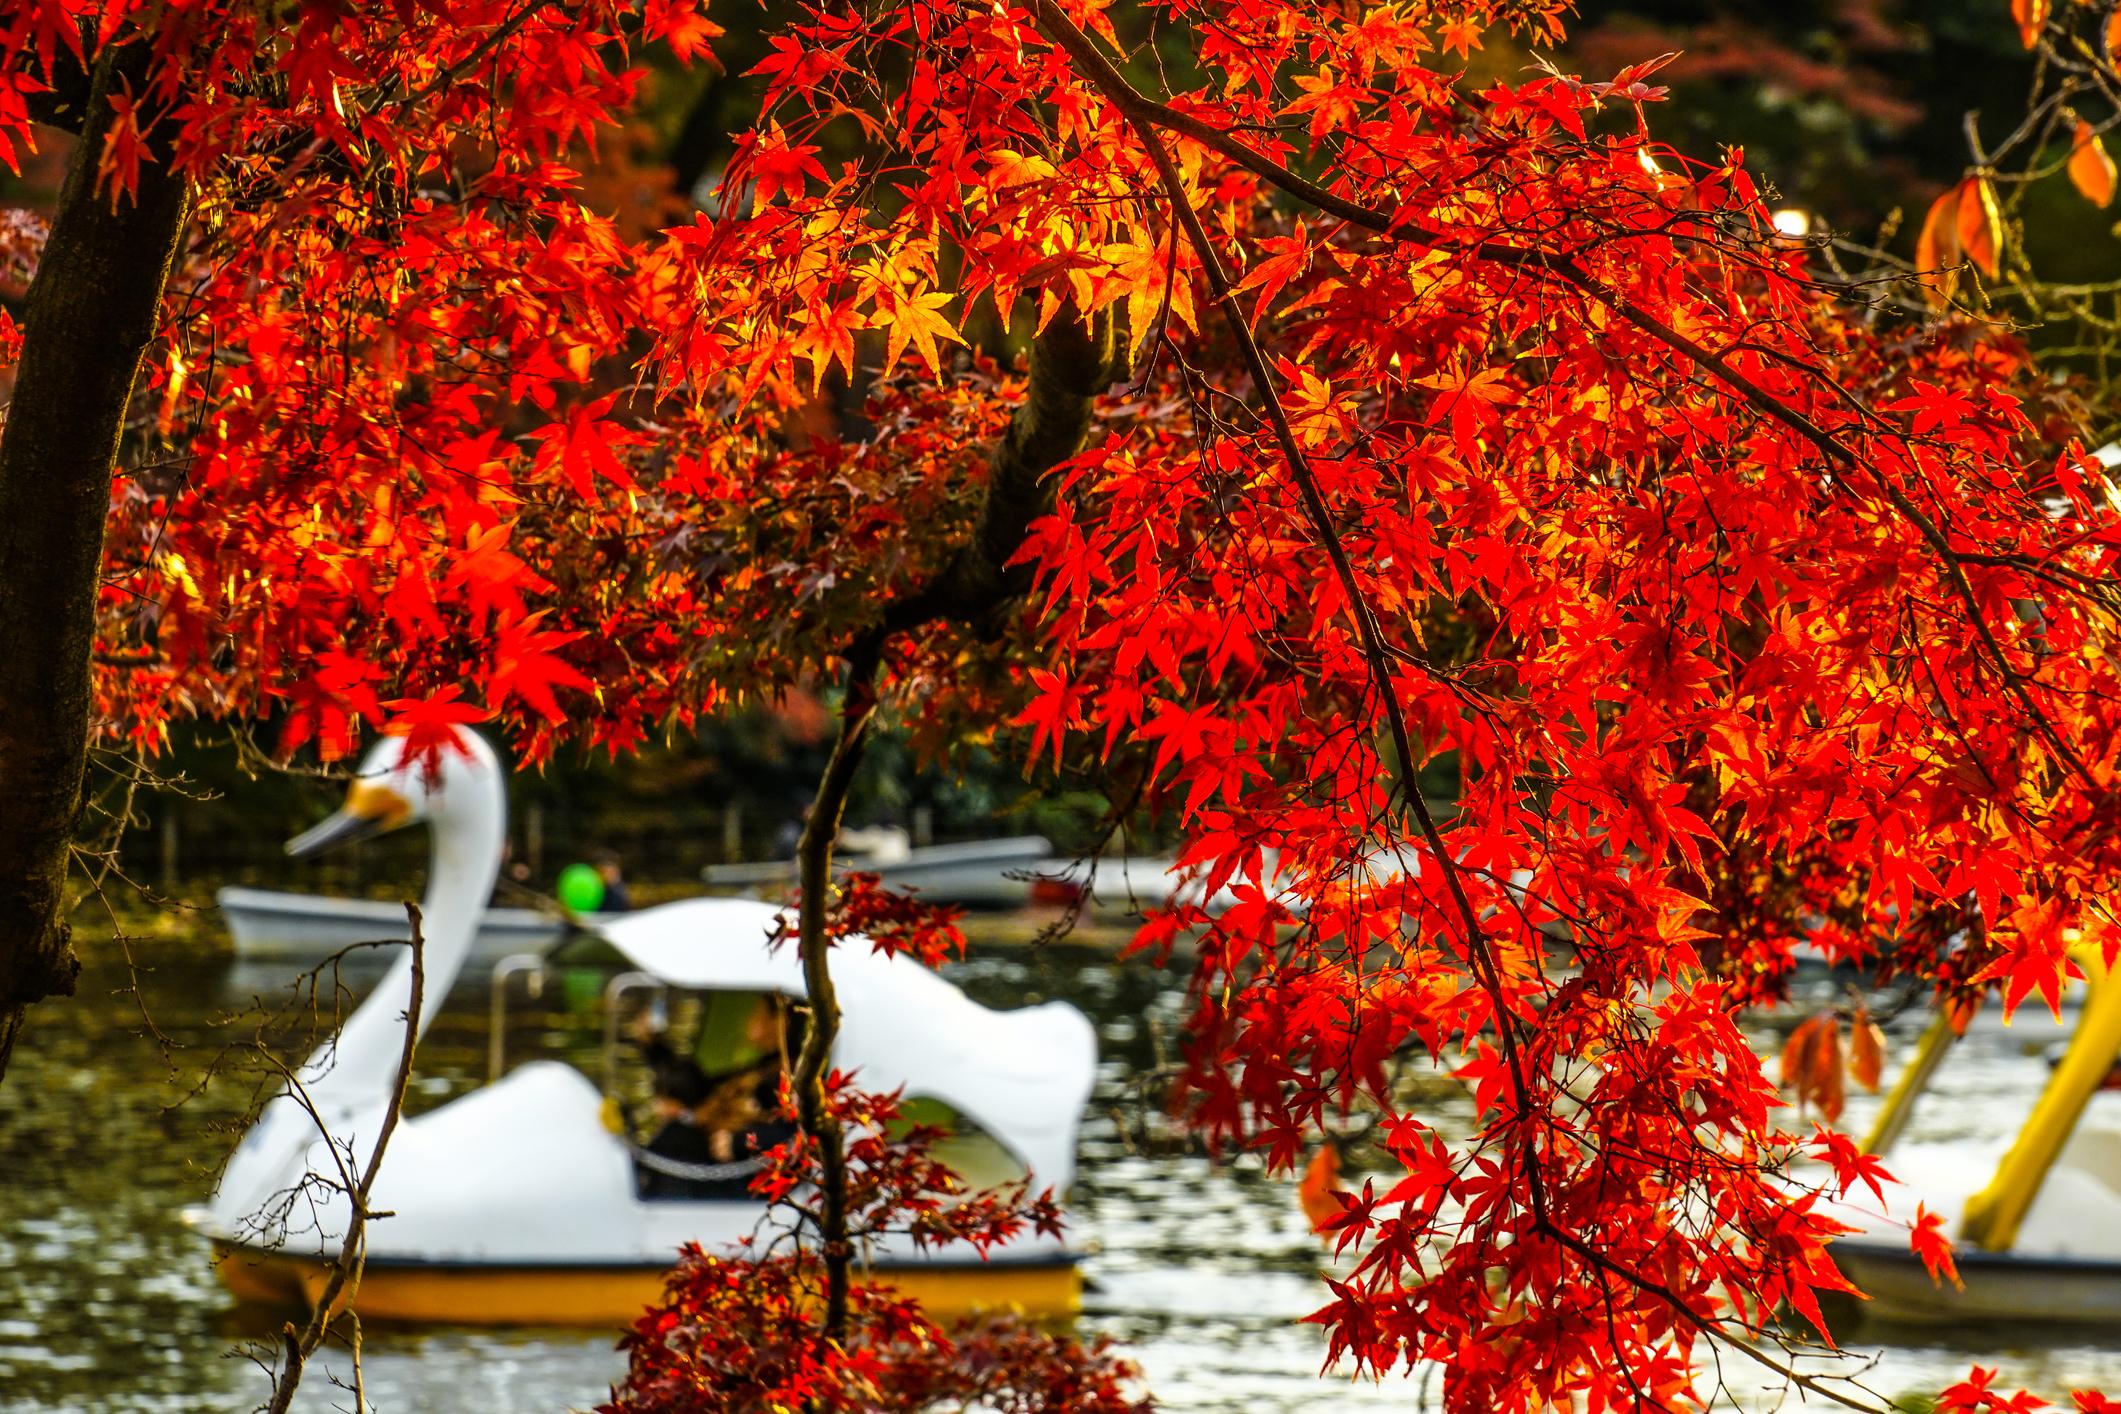 Inokashira Park in Kichijoji Photo: Makoto Honda/Dreamstime